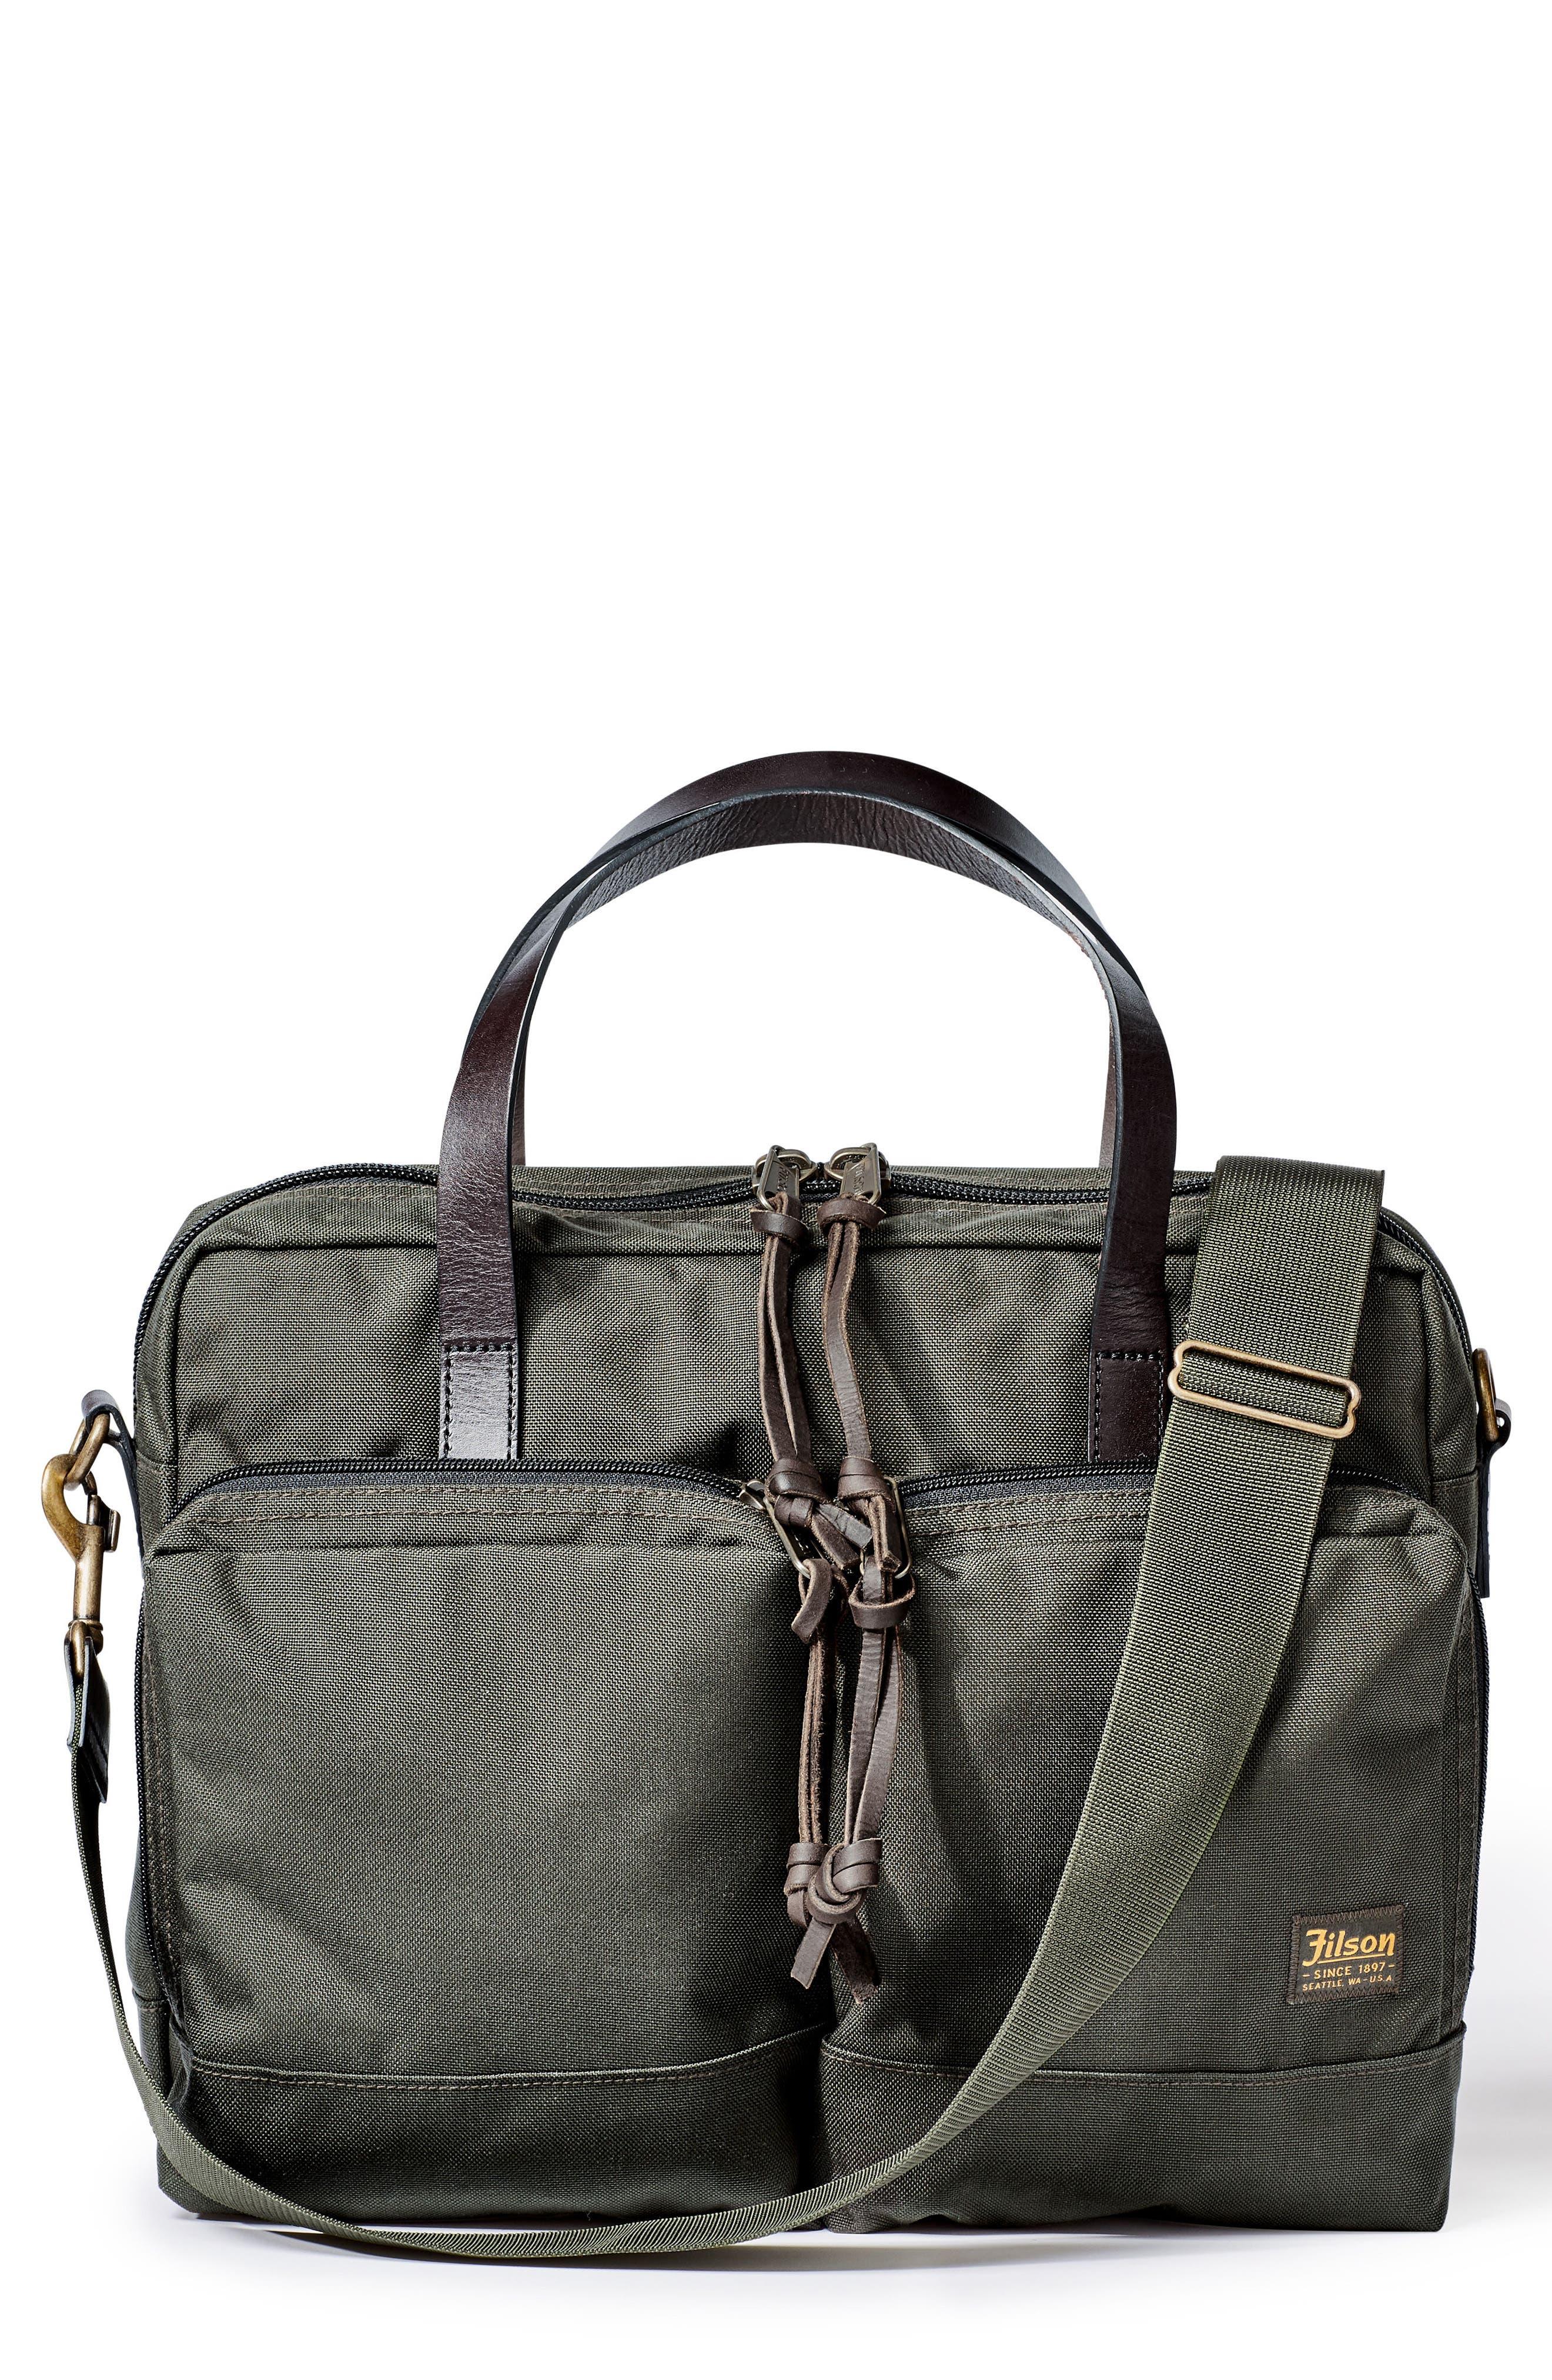 FILSON Dryden Briefcase - Green in Otter Green